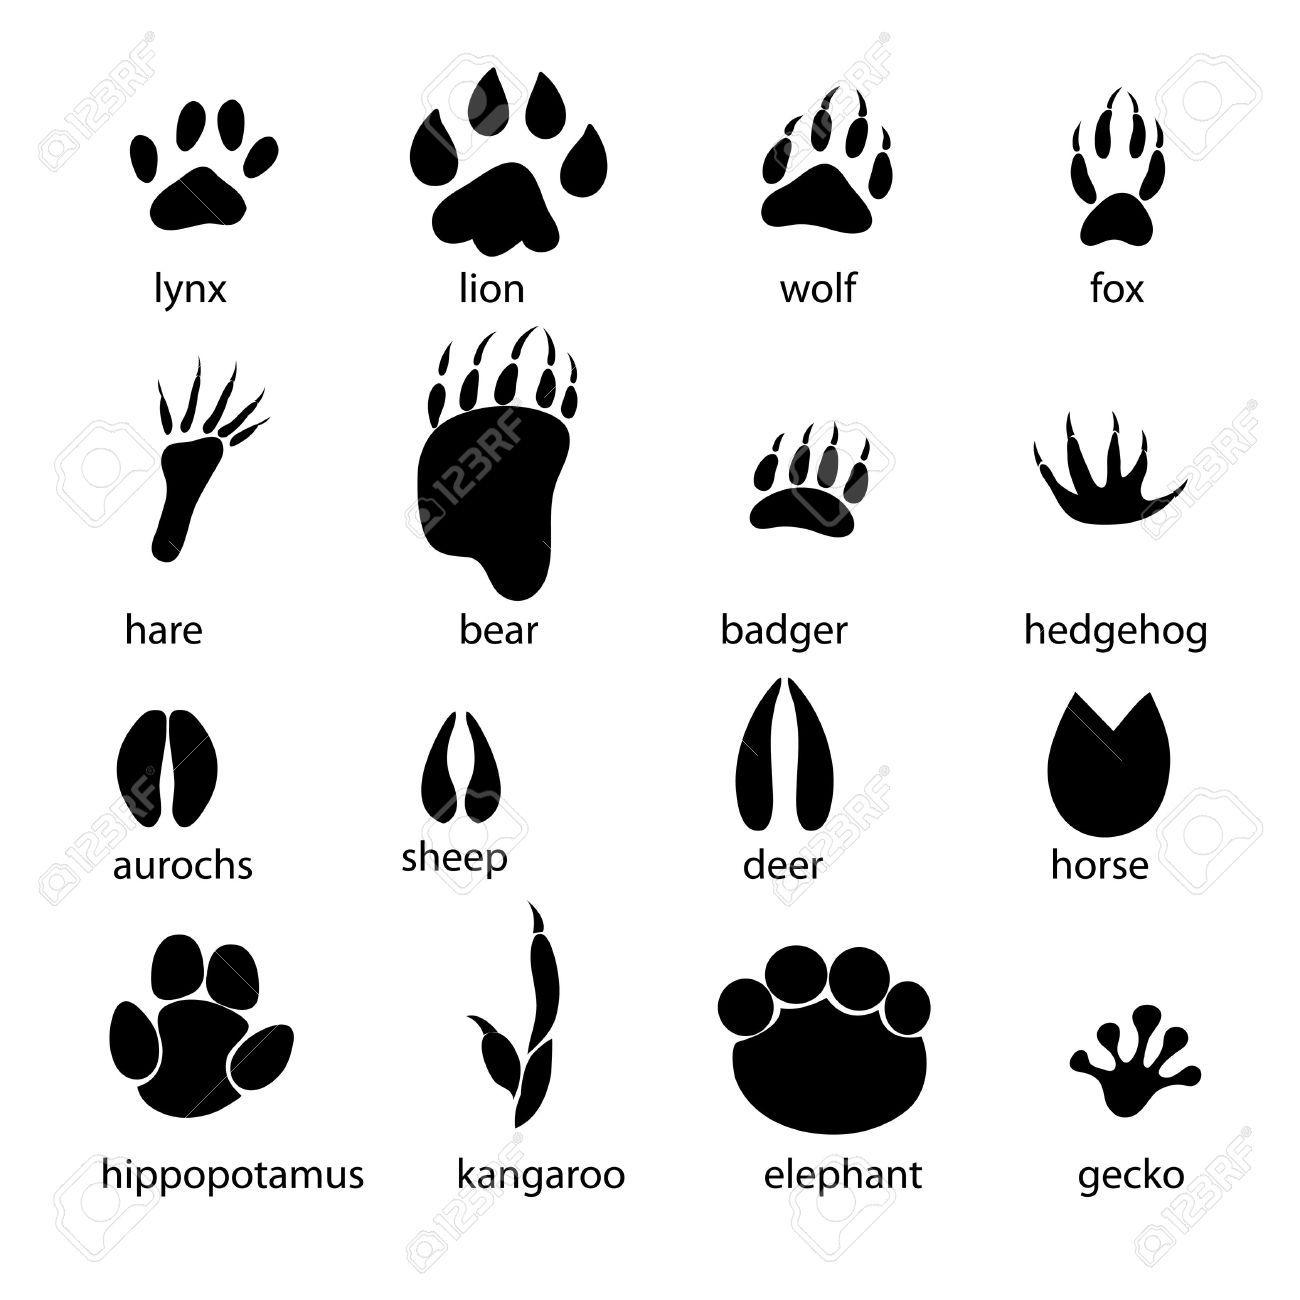 Pictures Of Bear Footprints Peepsburgh